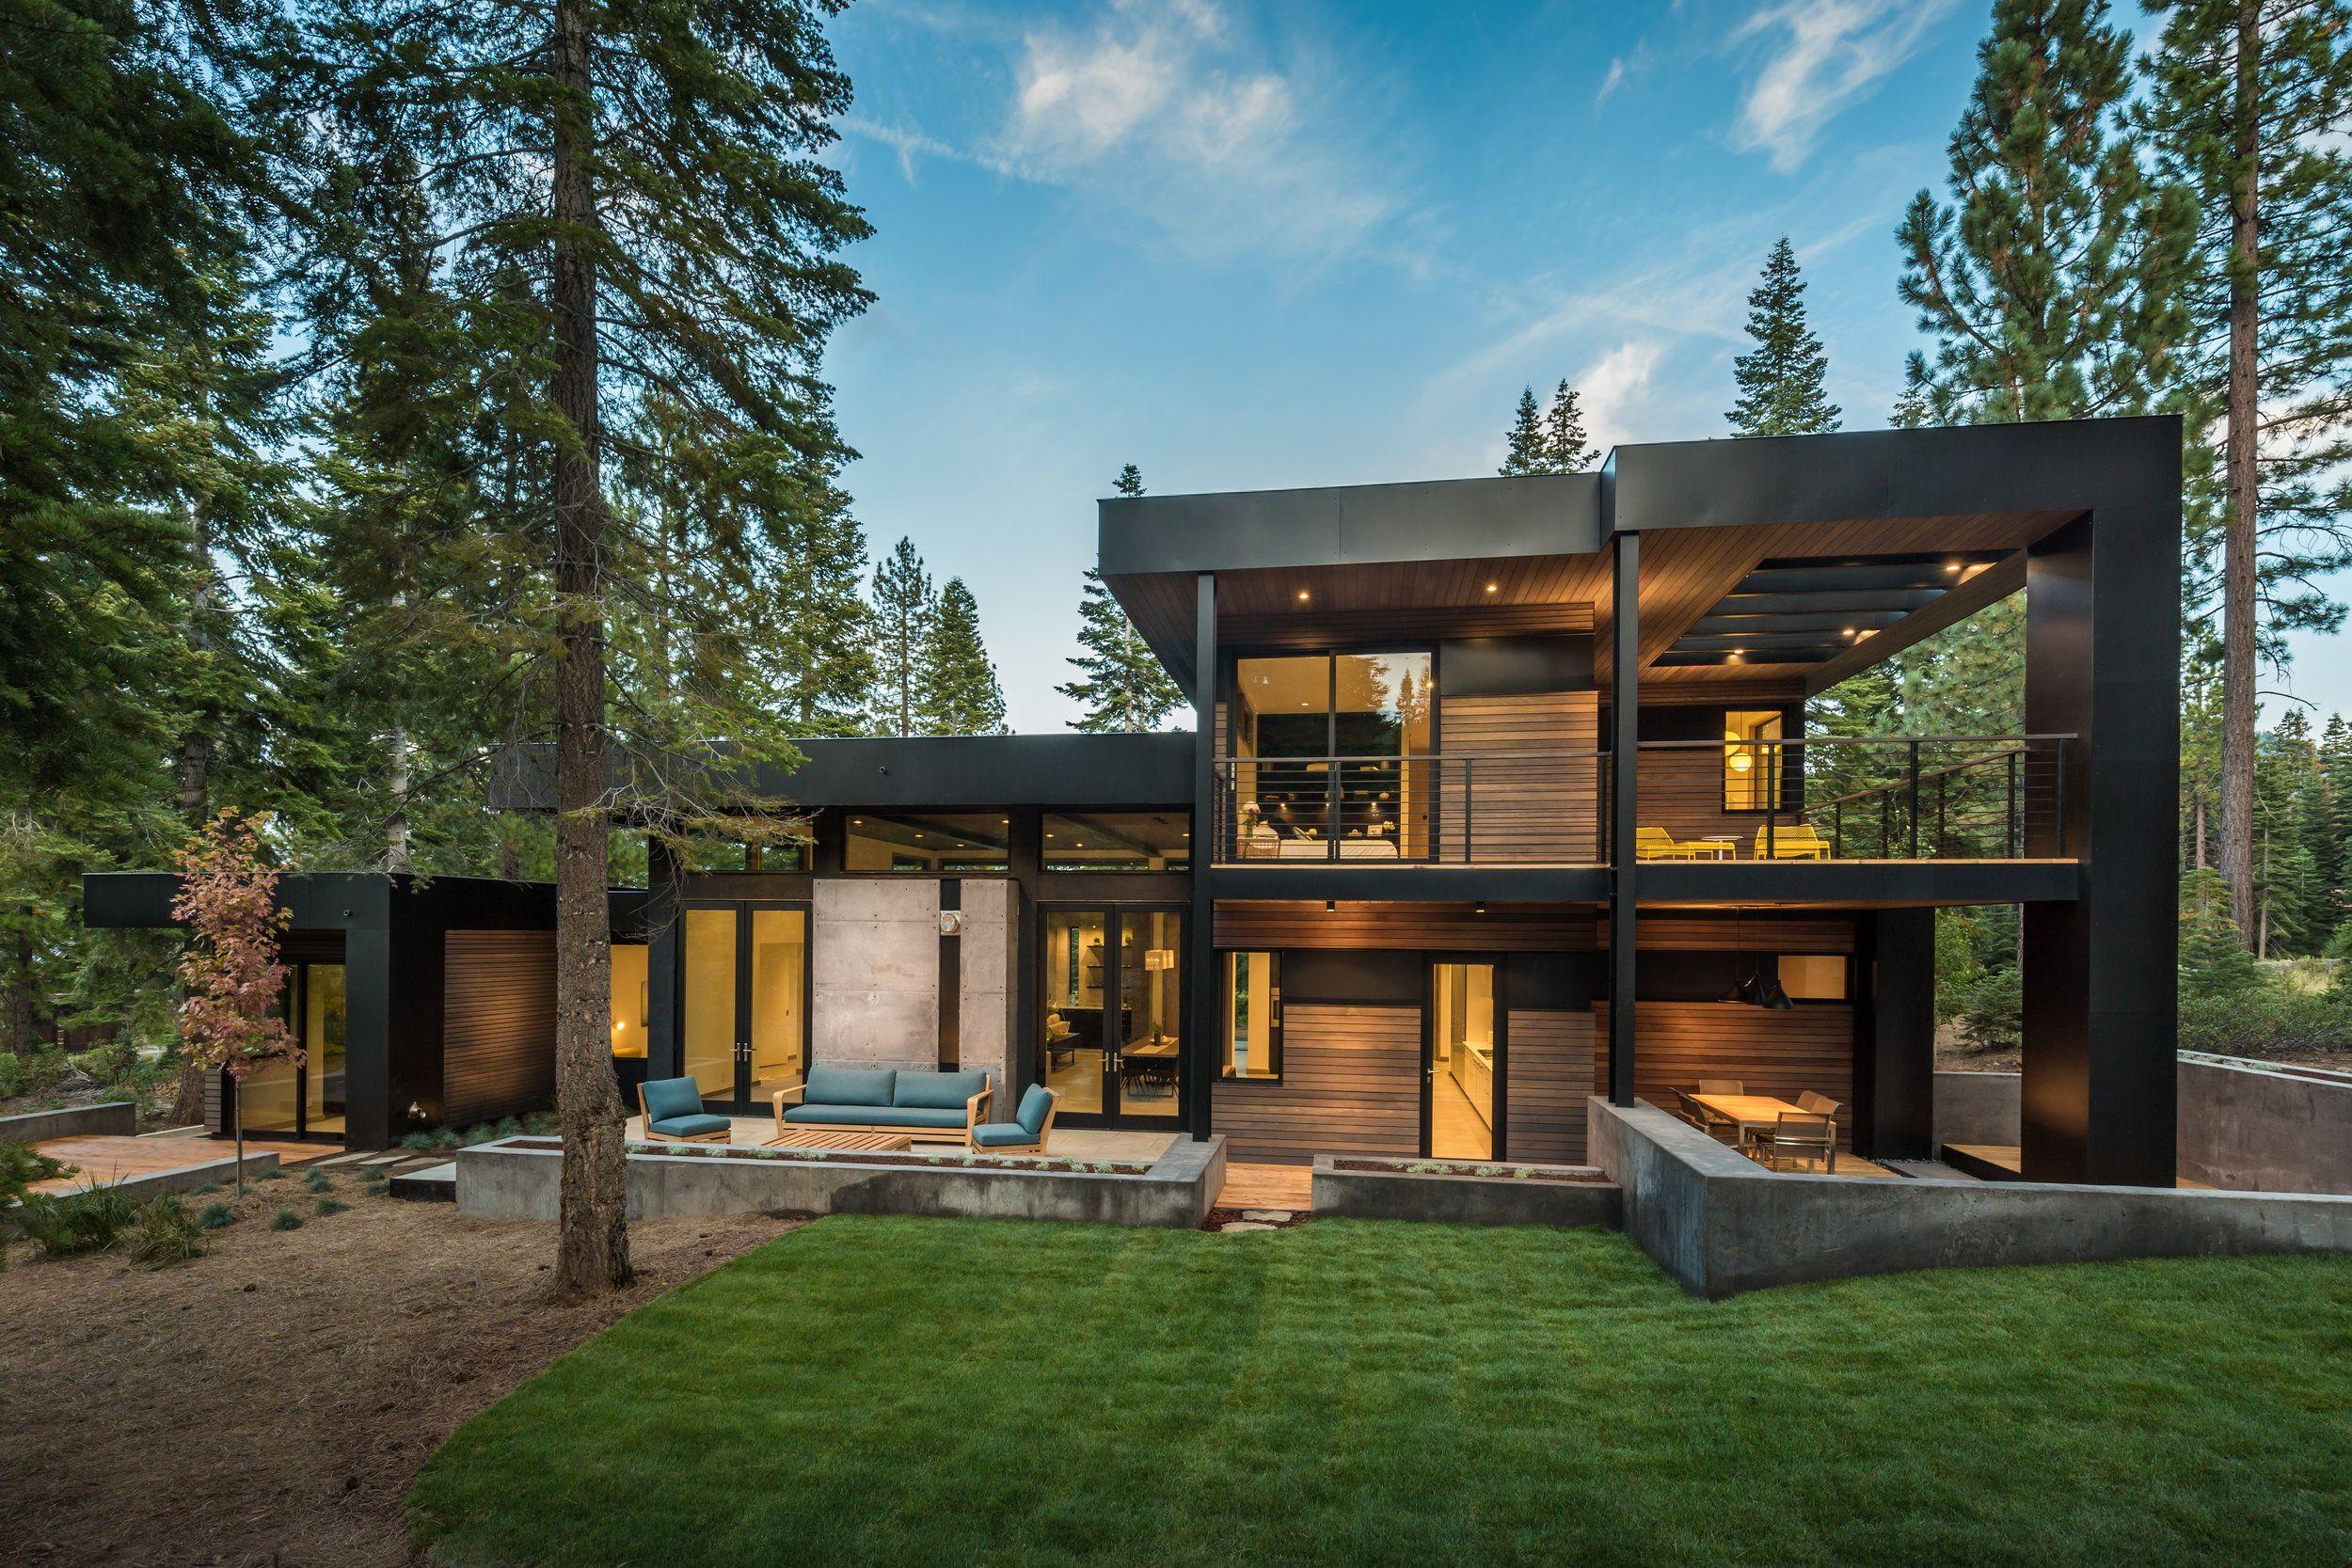 Sagemodern Prefab Beautiful Sagemodern Com Mountain Modern Prefab Homes Modern Wooden House